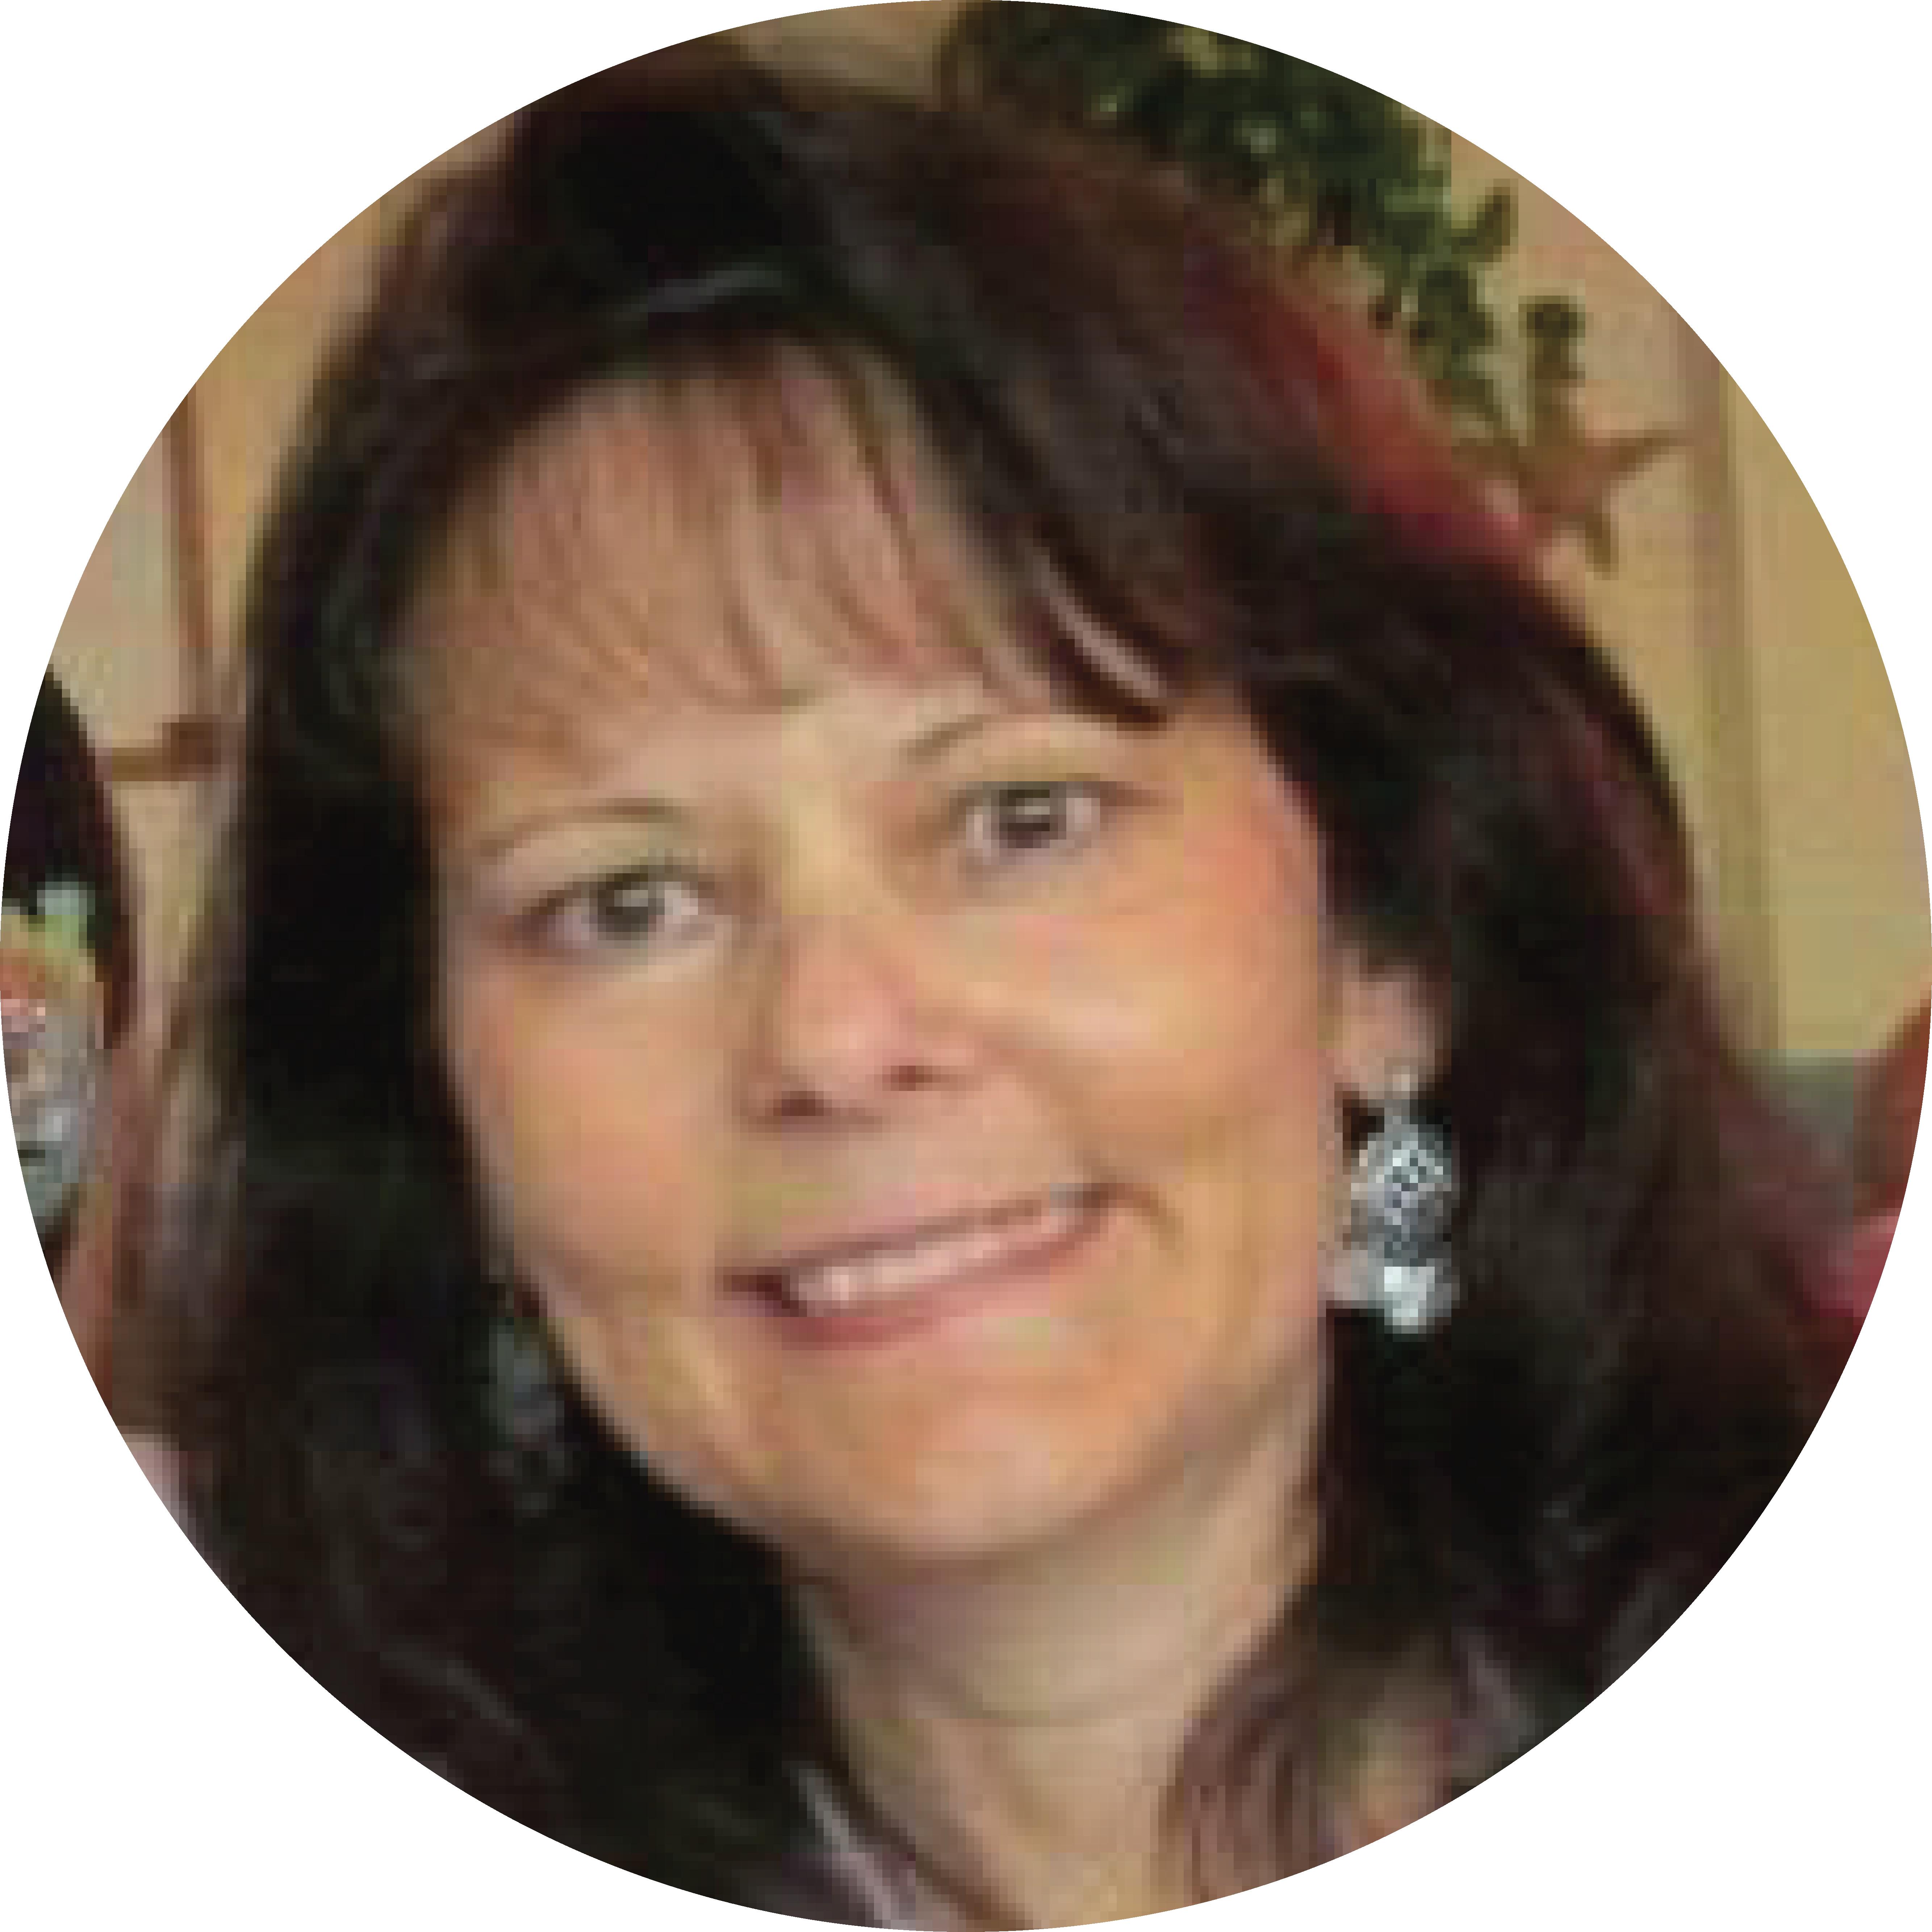 Sheila Peterson